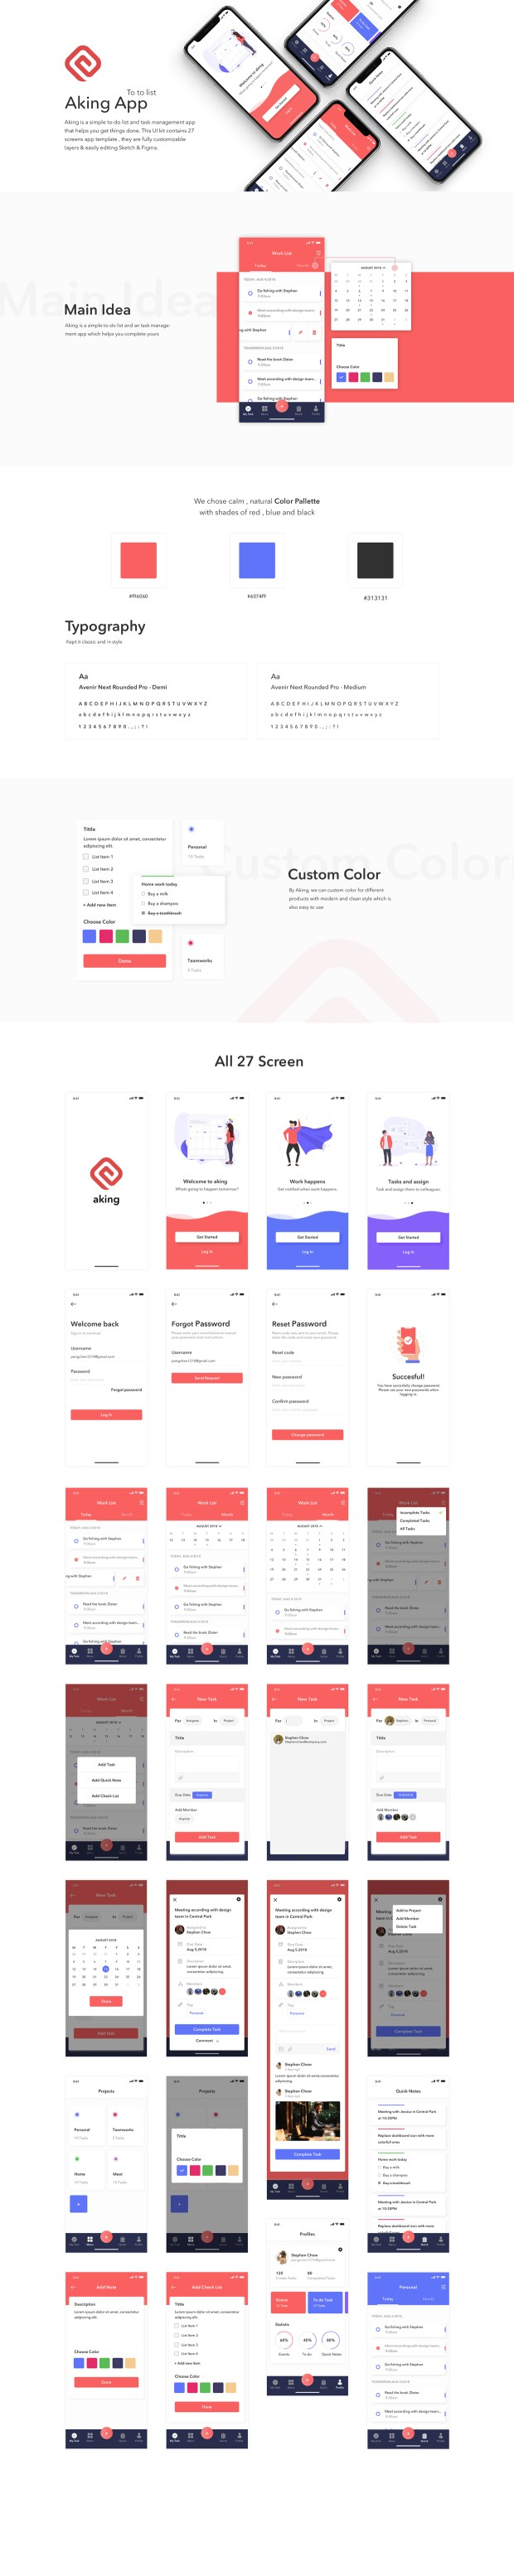 Aking Todo List App Free UI Kit